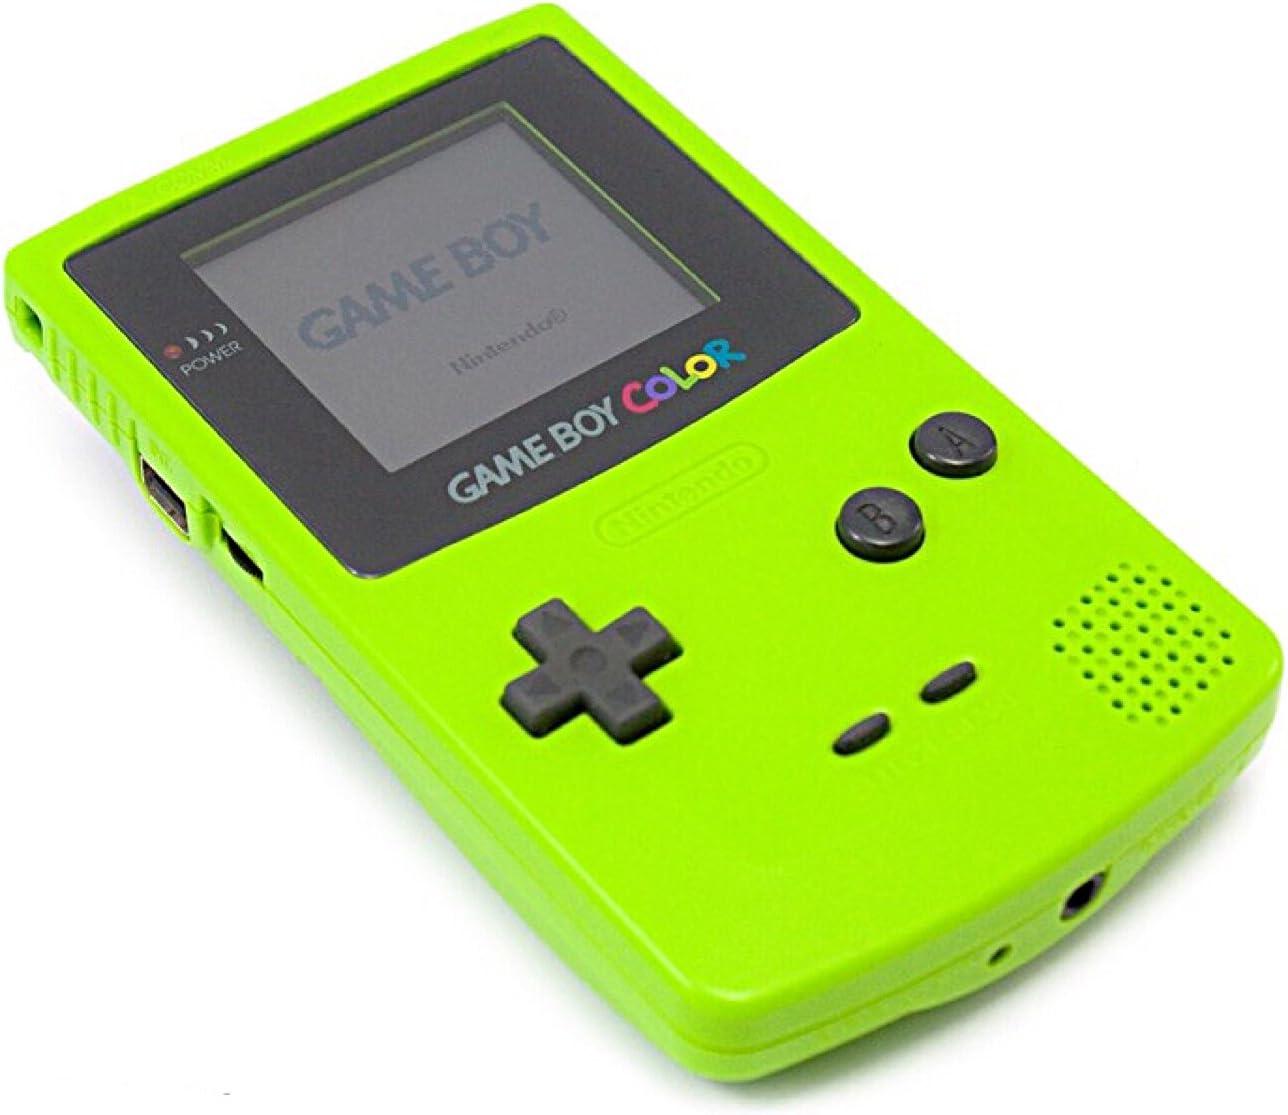 Amazon.com: Game Boy Color - Kiwi: Nintendo Game Boy Color: Video Games